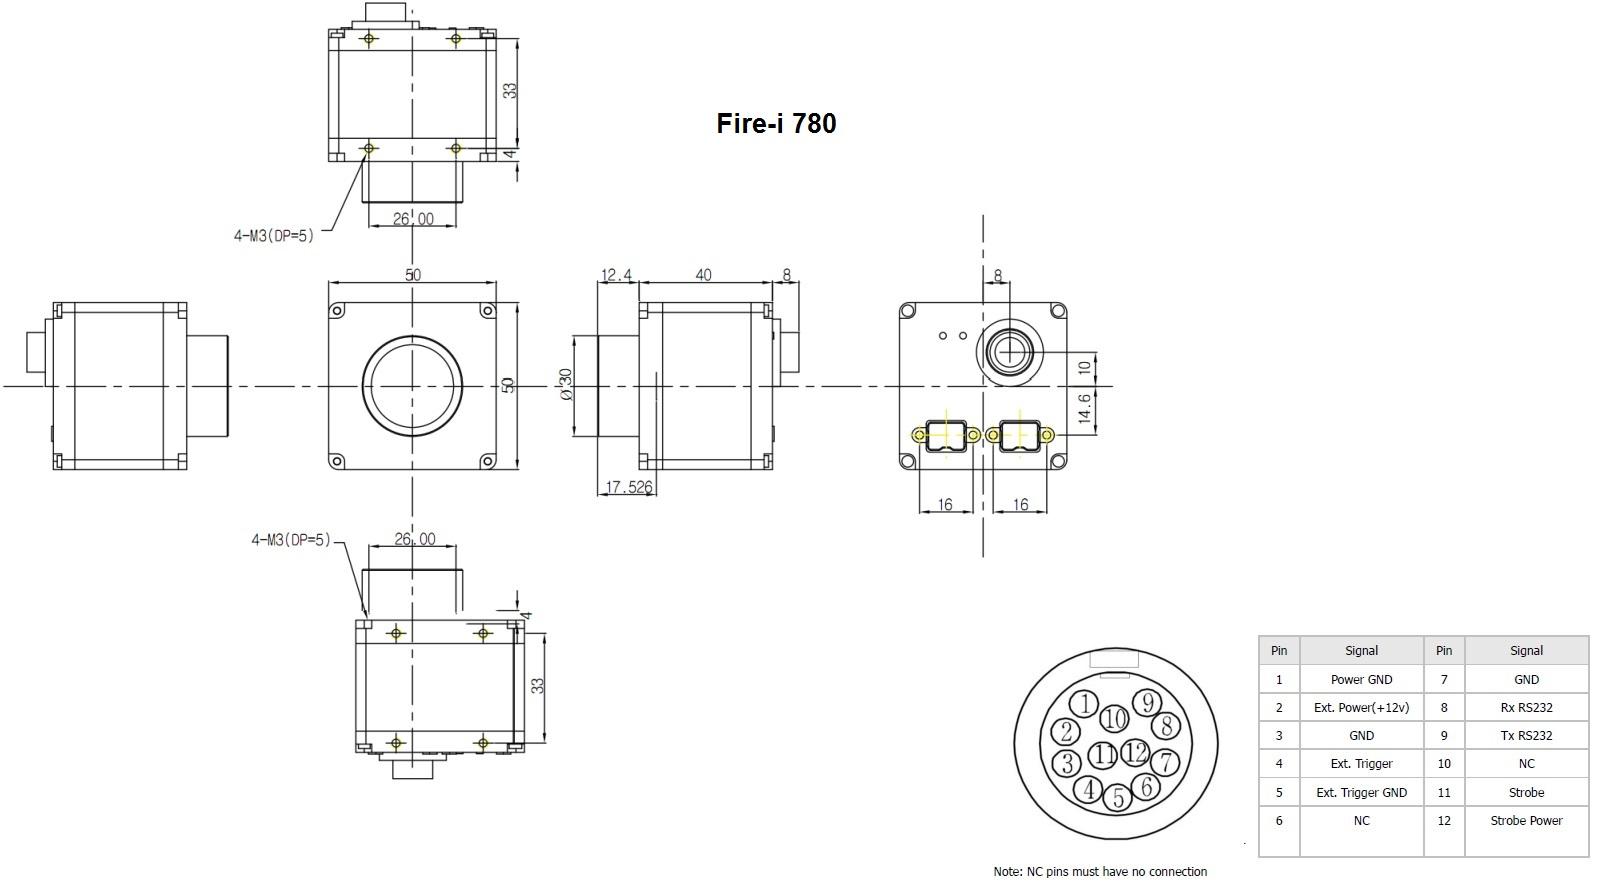 volvo diagram 2013 wiring vhd84f200 volvo tri